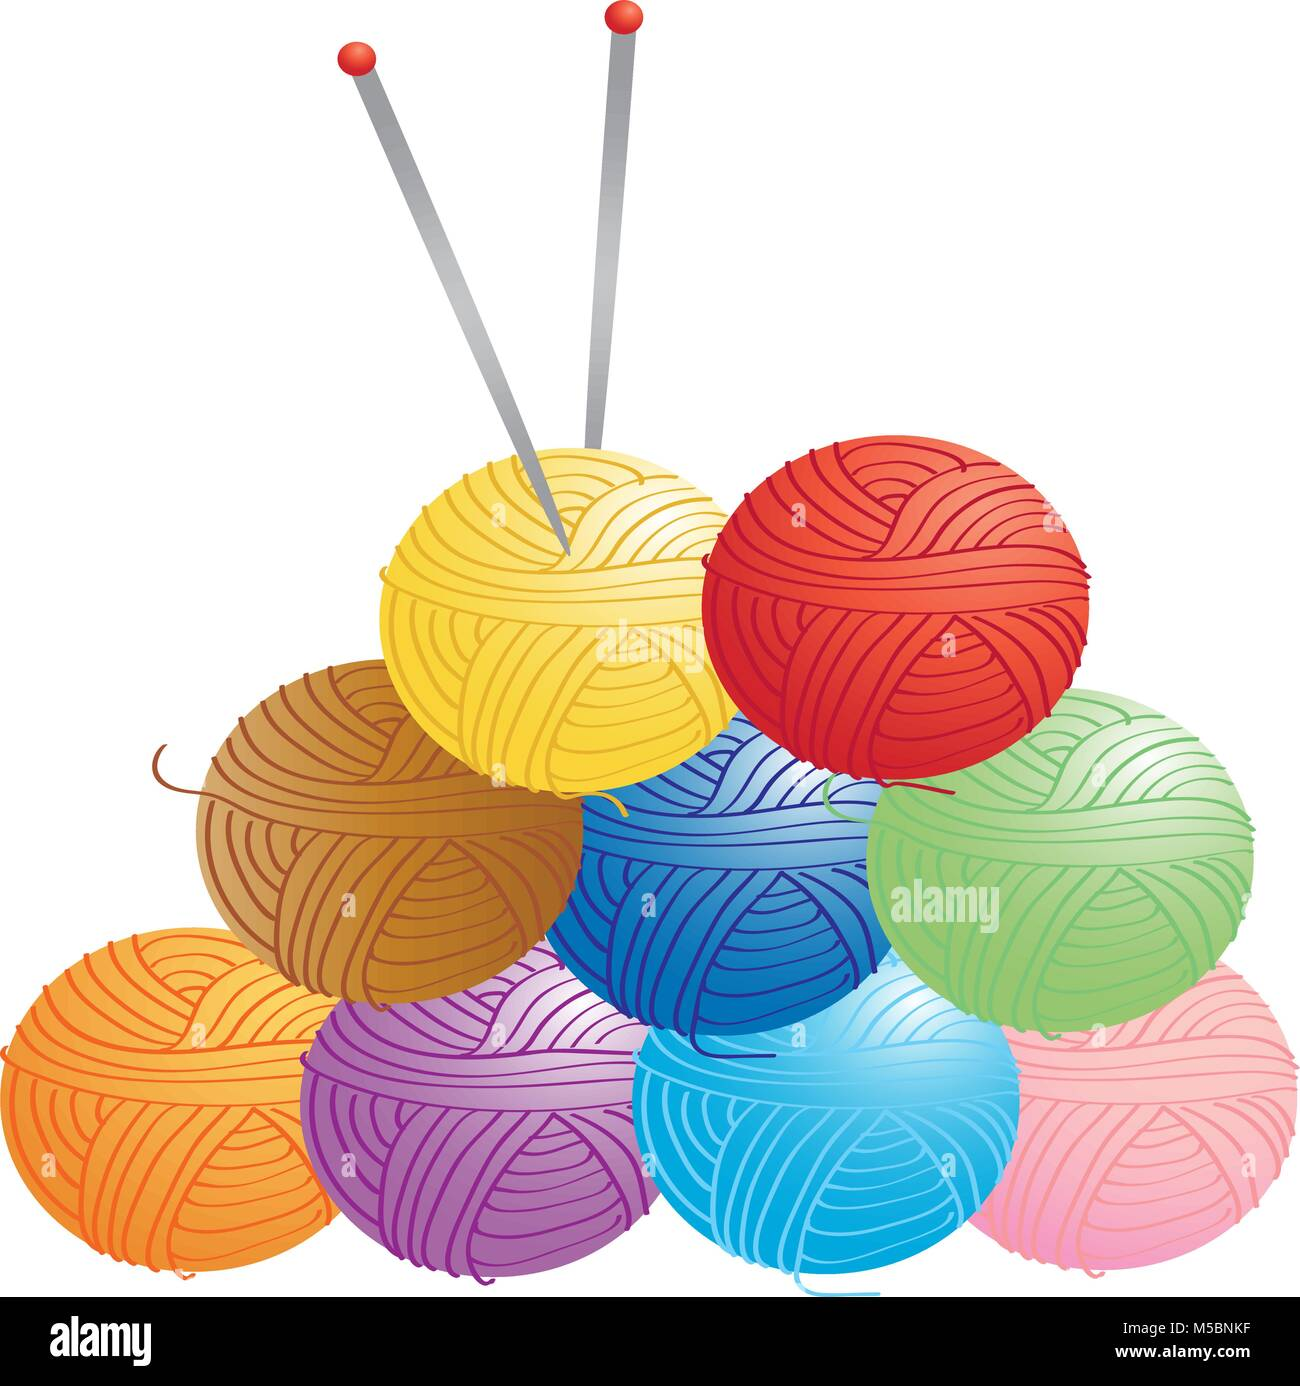 Cartoon illustration of several balls of wool and knitting needles - Stock Vector